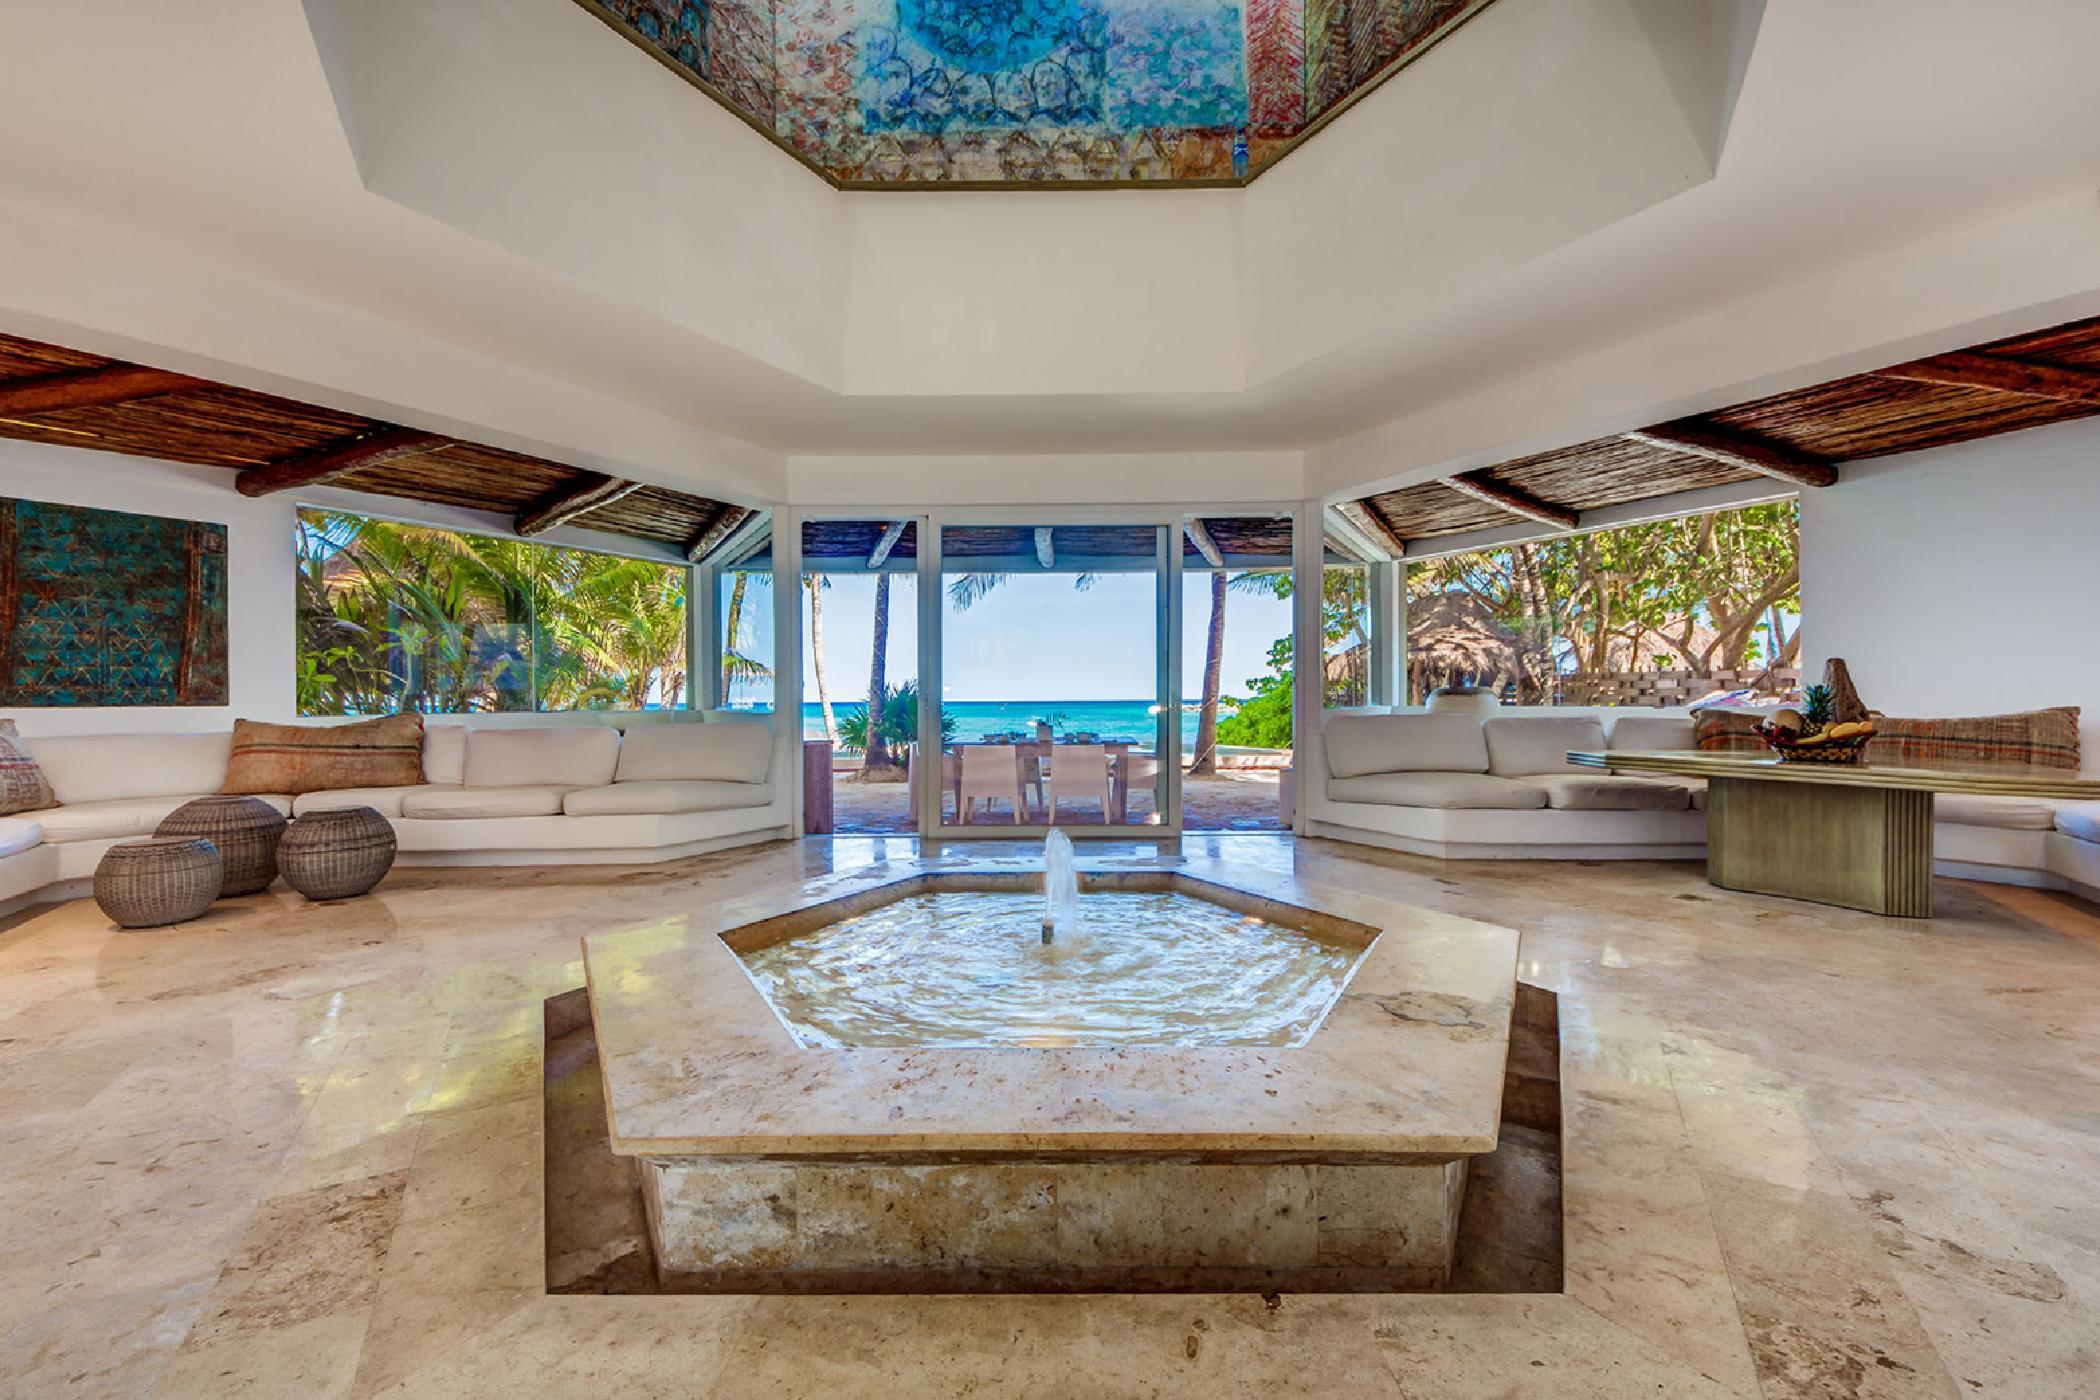 Maya_Luxe_Riviera_Maya_Luxury_Villas_Experiences_Puerto_Aventuras_5_Bedrooms_Zacil_Na_8.jpg